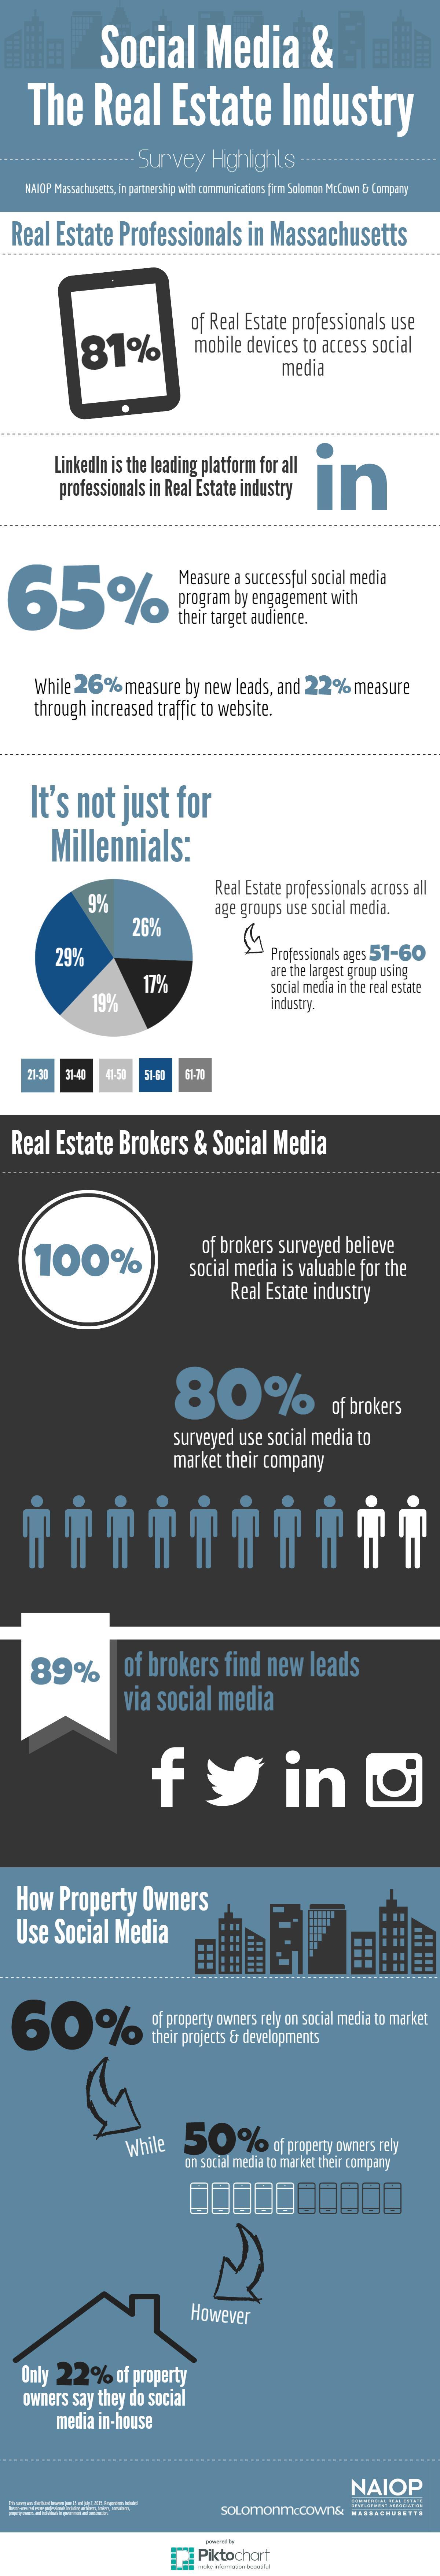 SMC-NAIOP_SocialMediaRE-infographic